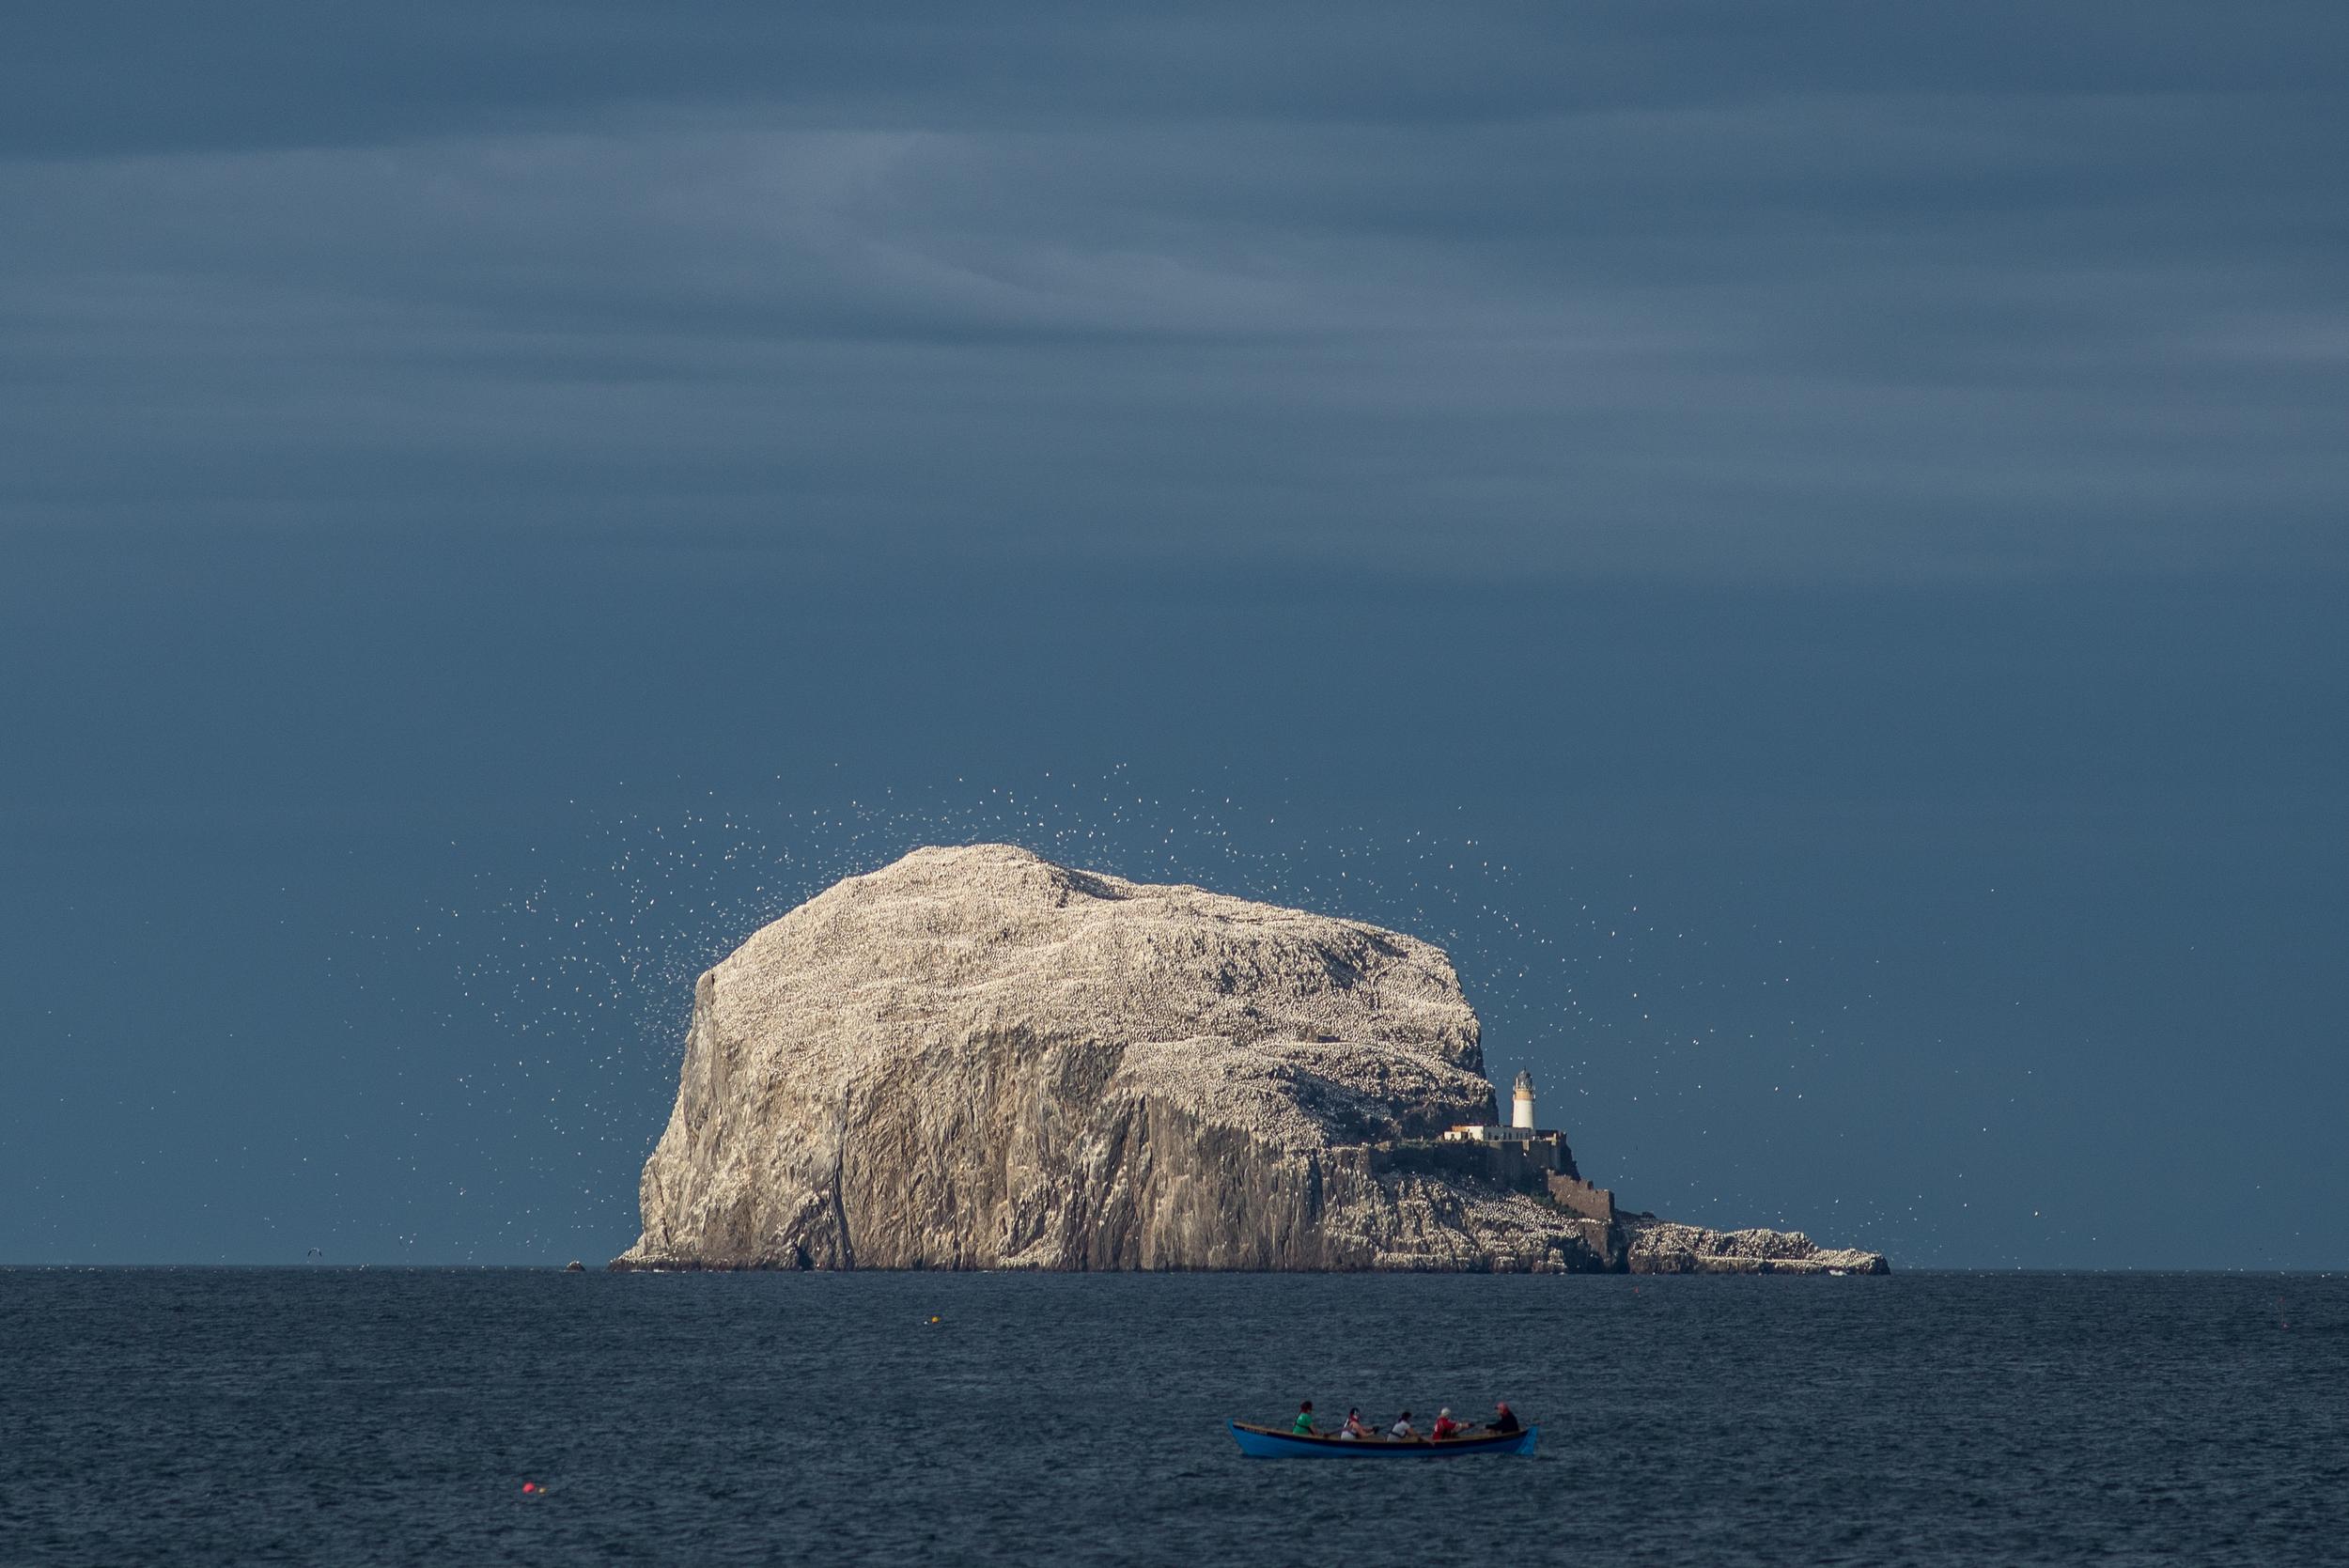 Bass Rock, North Berwick, Scotland. 2015